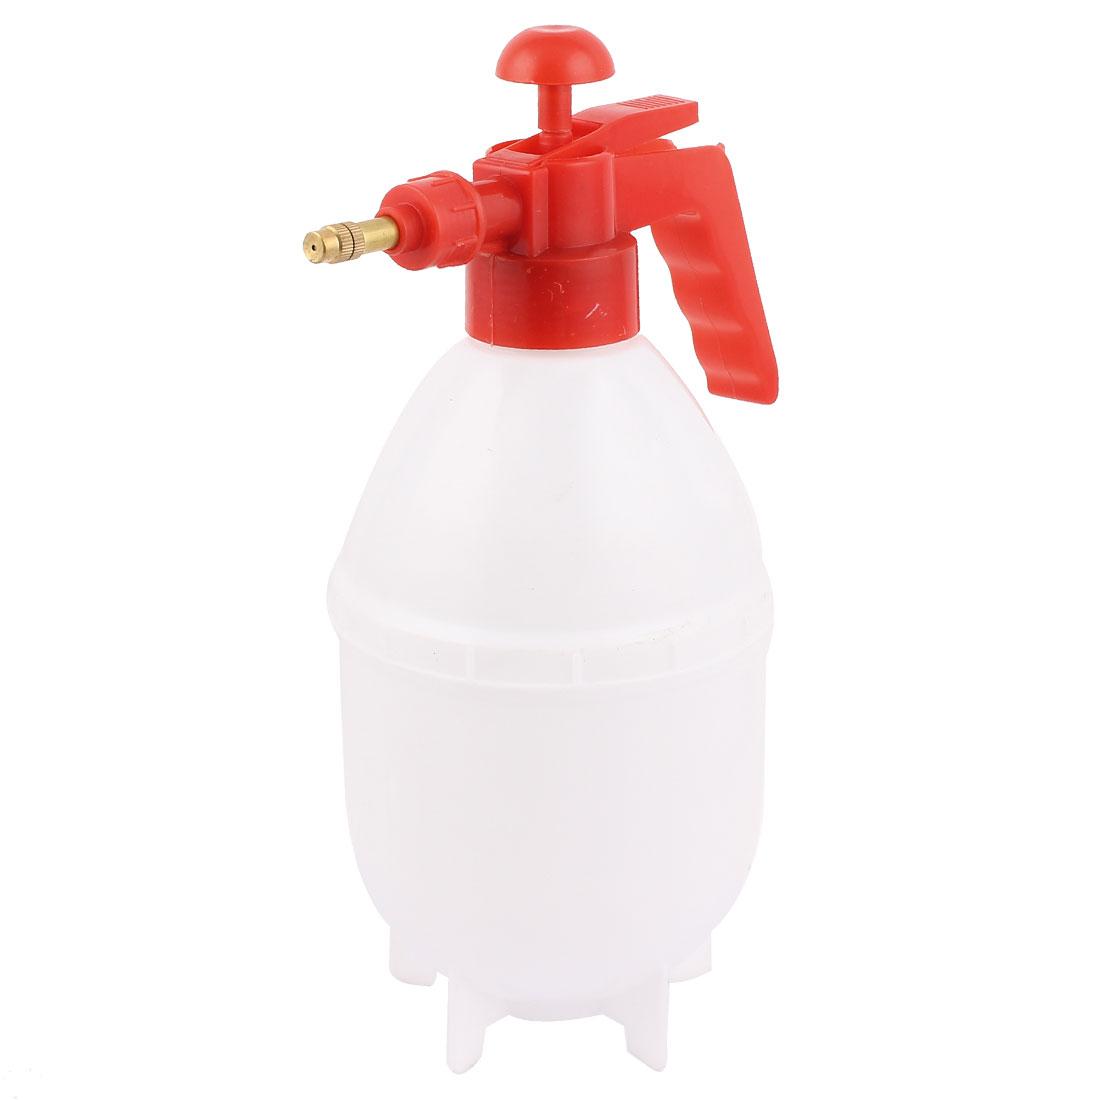 Red Handle White Body Plastic Plant Flower Watering Water Pressure Sprayer Spray Bottle 1500Ml